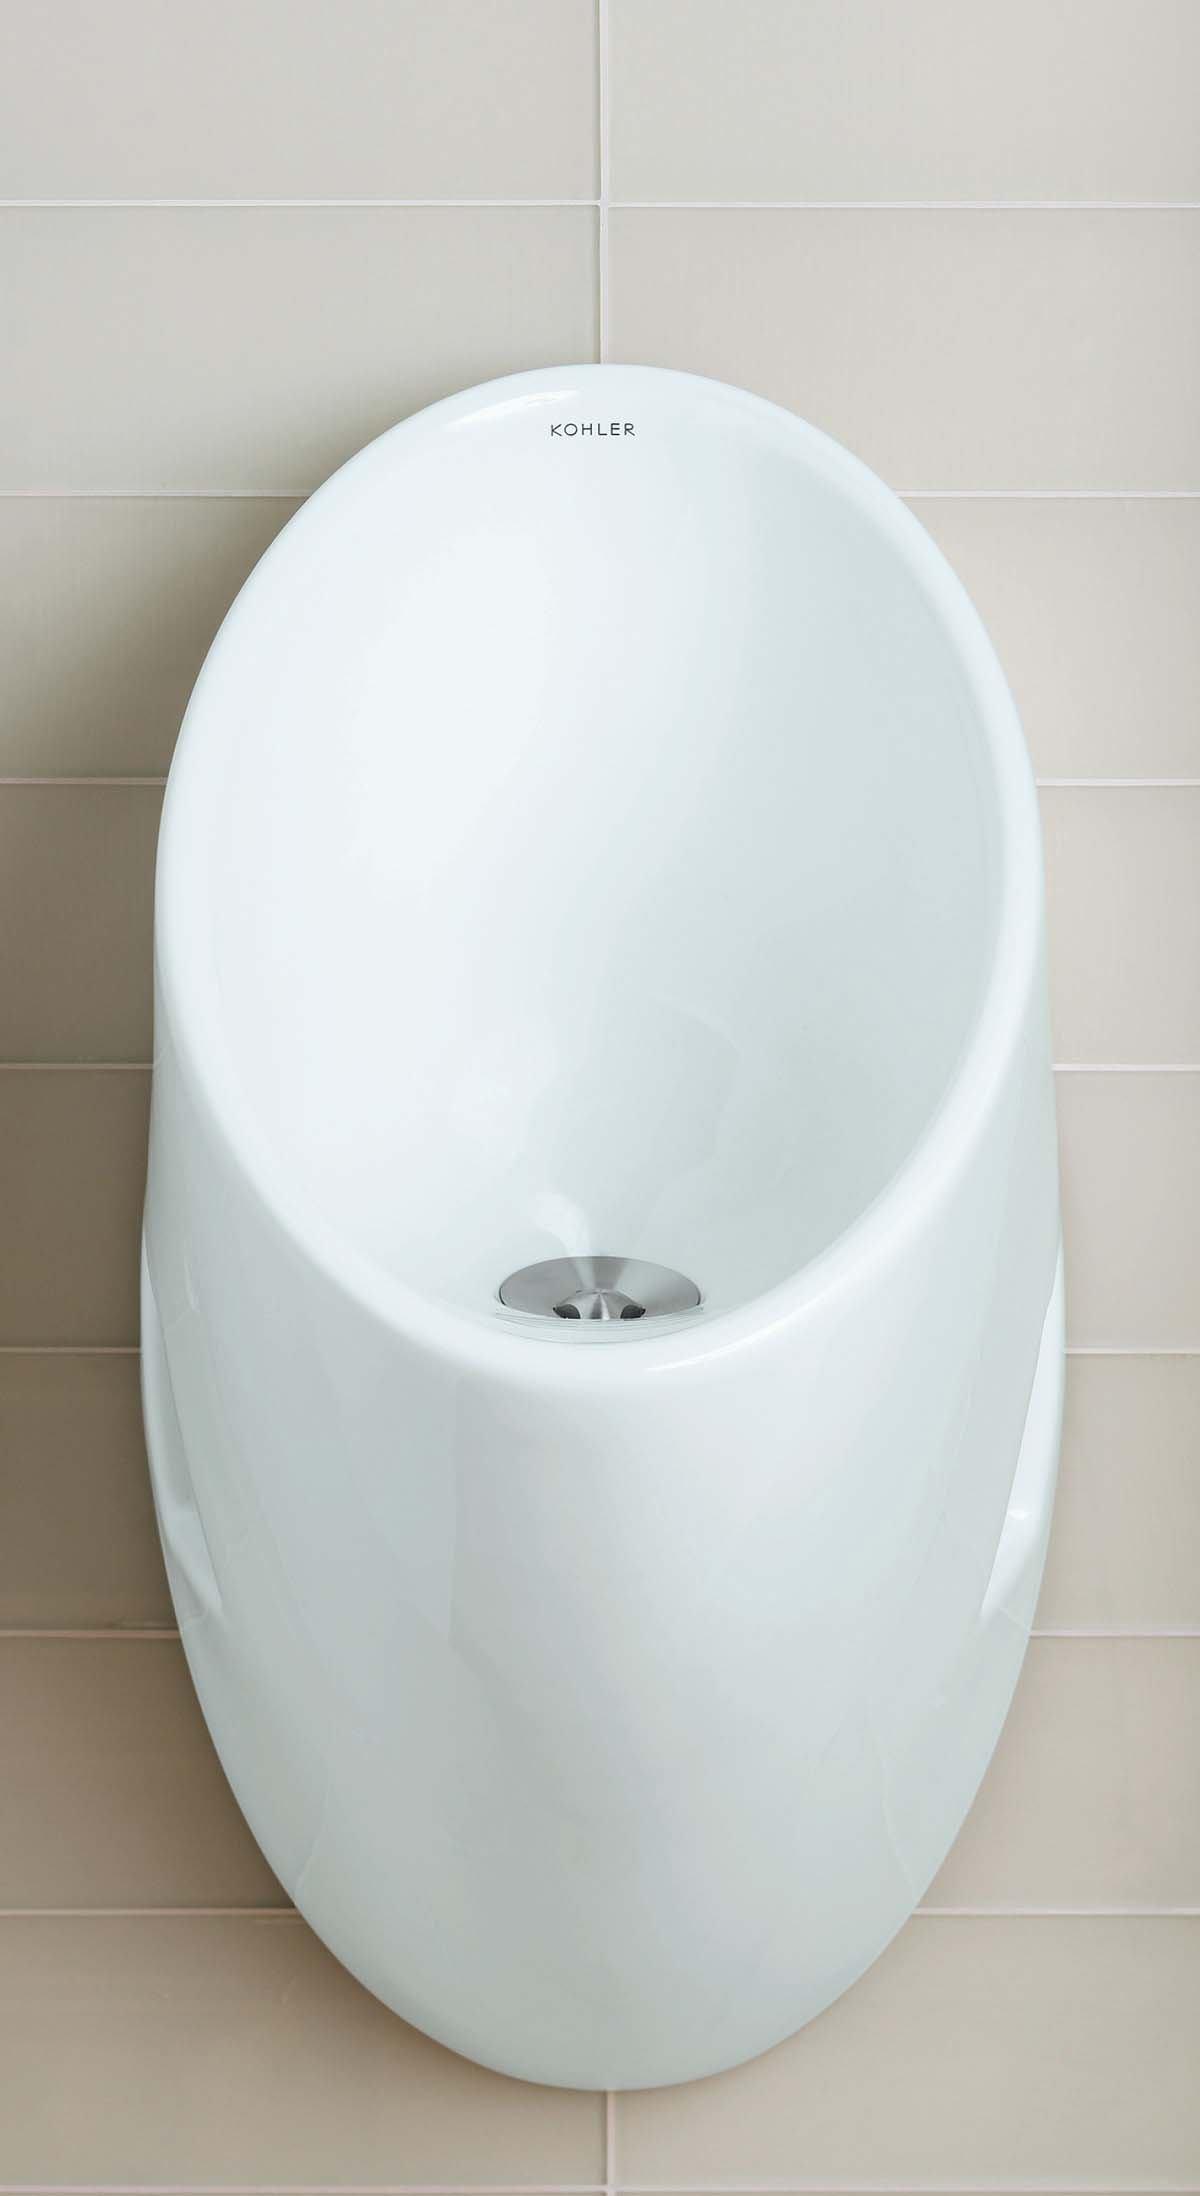 14 50 Outlet >> Steward waterless urinal from Kohler | Architect Magazine ...